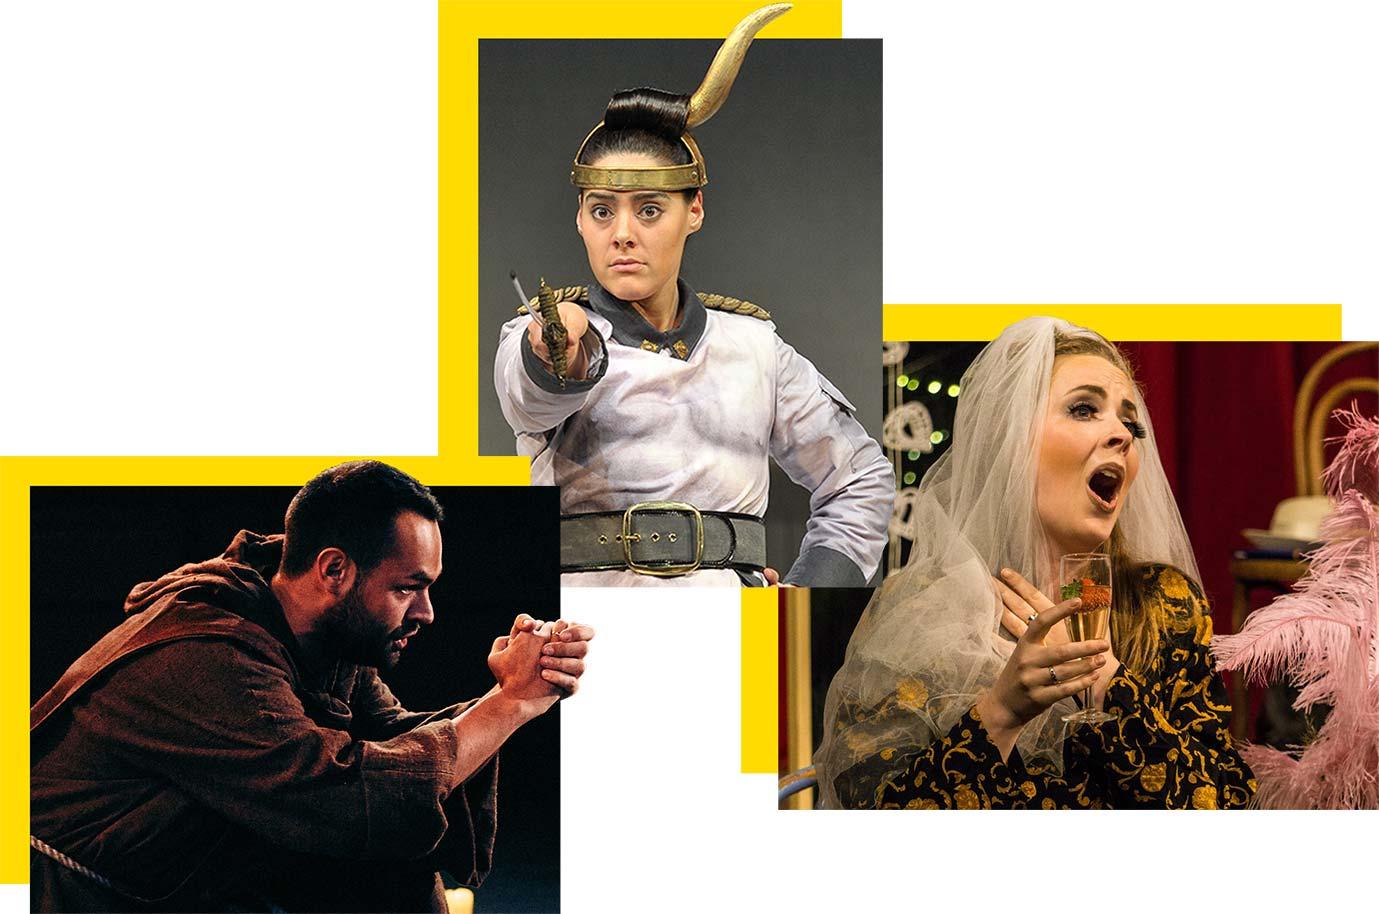 Helen Sykes Artists' Management – Opera artist agency based in London